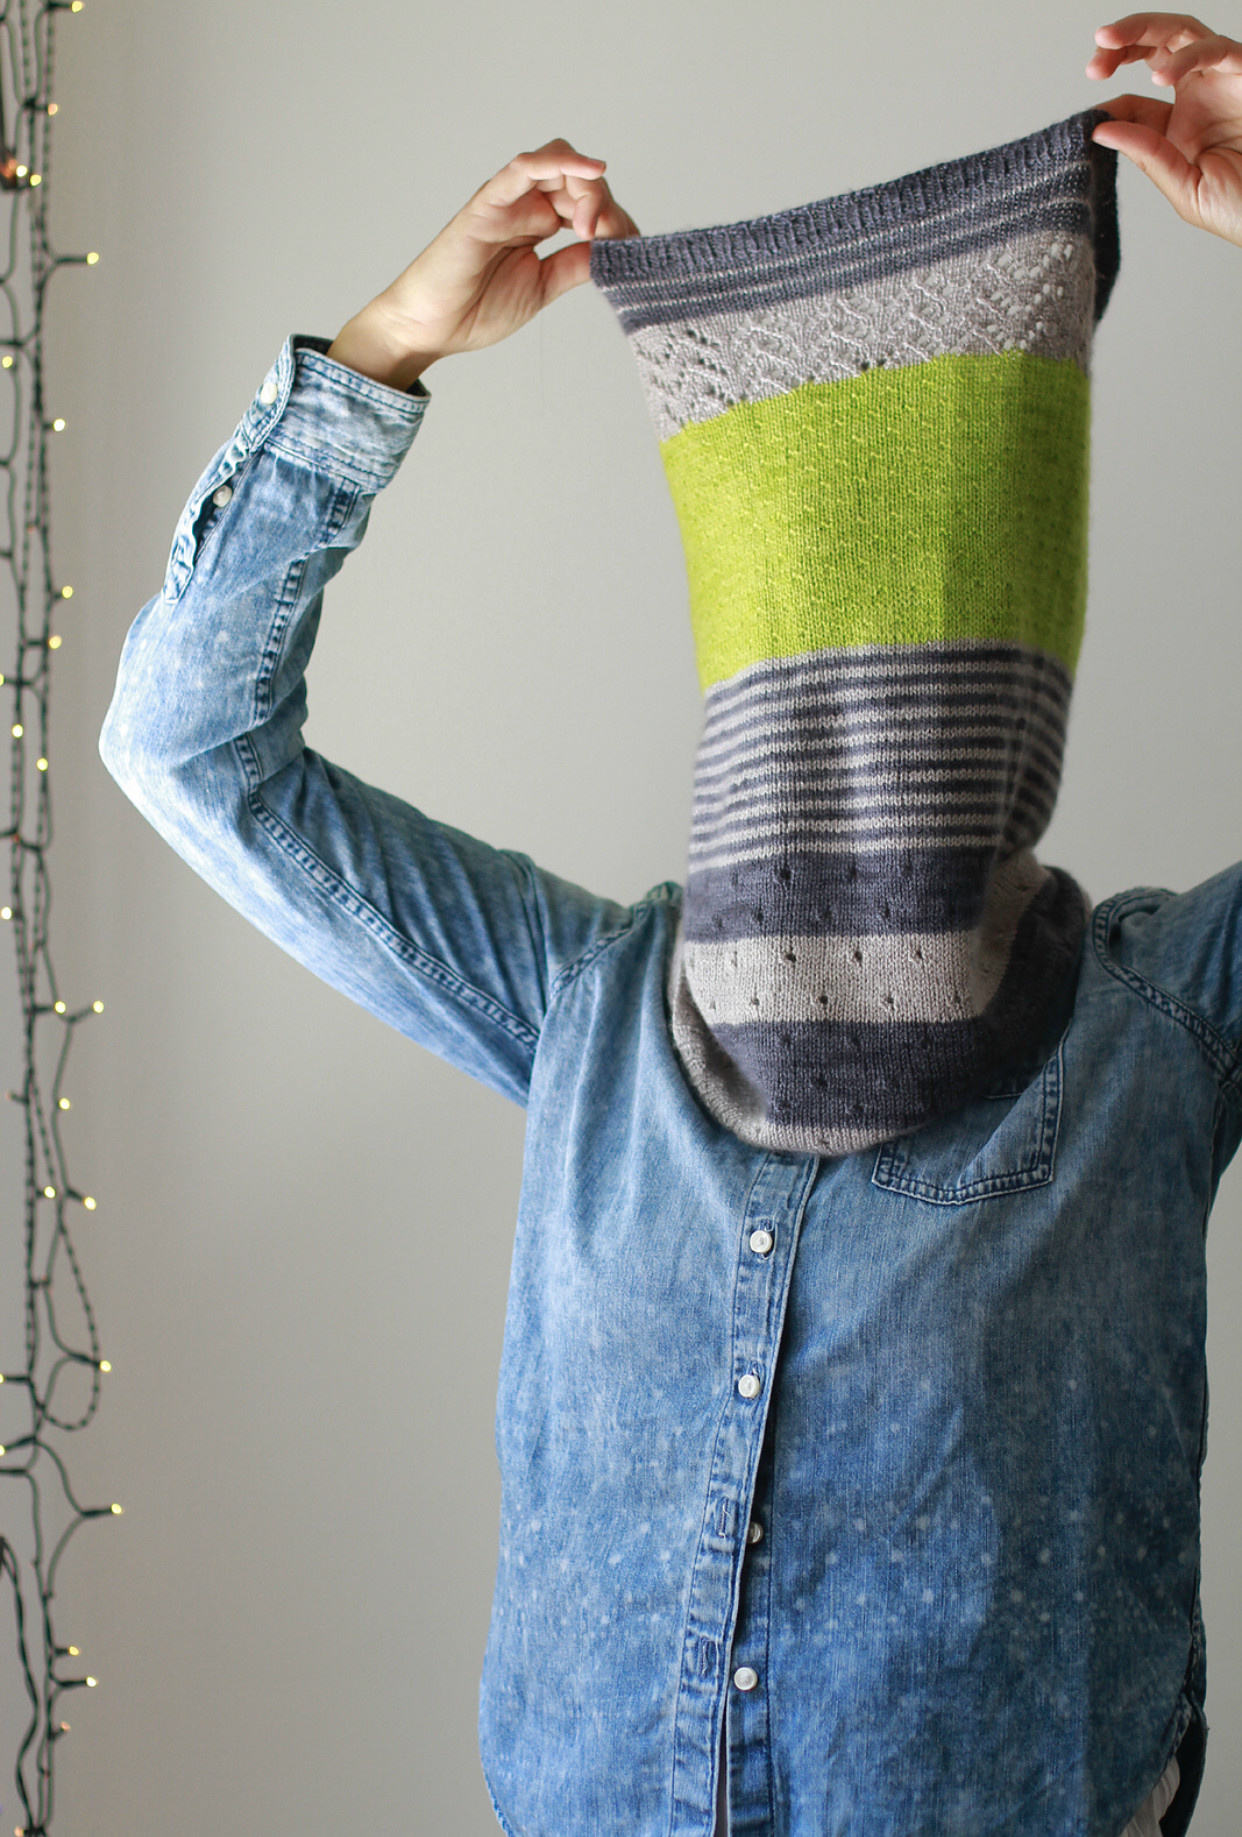 Ravelry Patterns 3 Color Cashmere Cowl by Joji